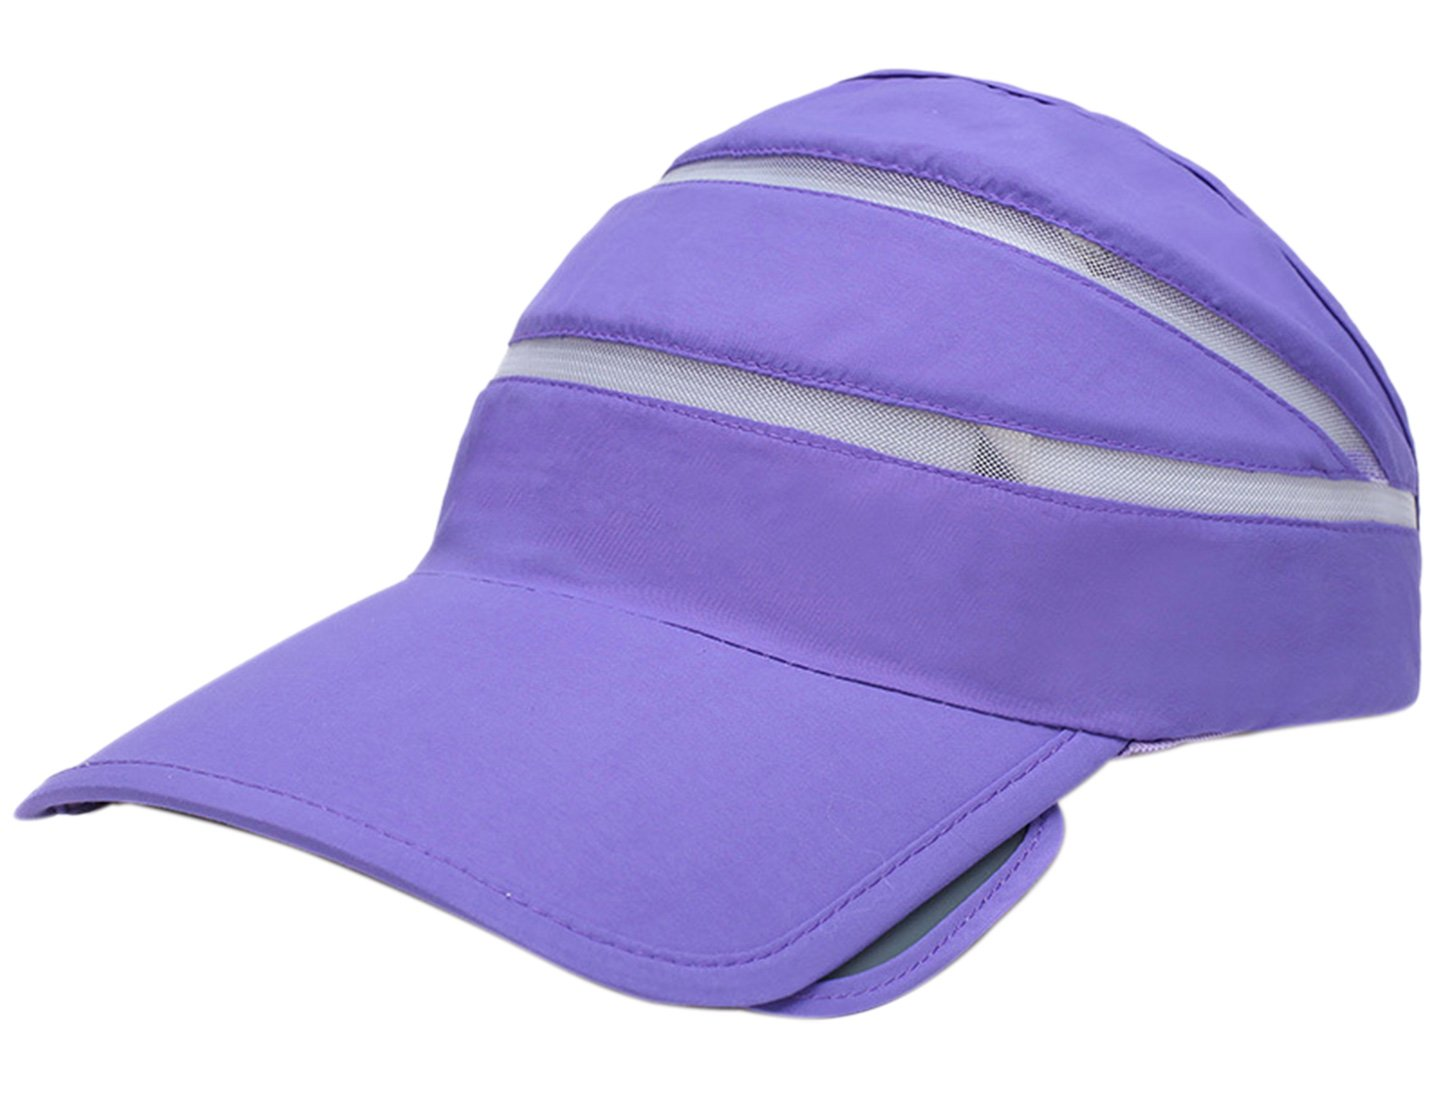 Panegy Womens Sunhat Large Brim Outdoor Sports Cap Beach Visor Cap Bucket Hat